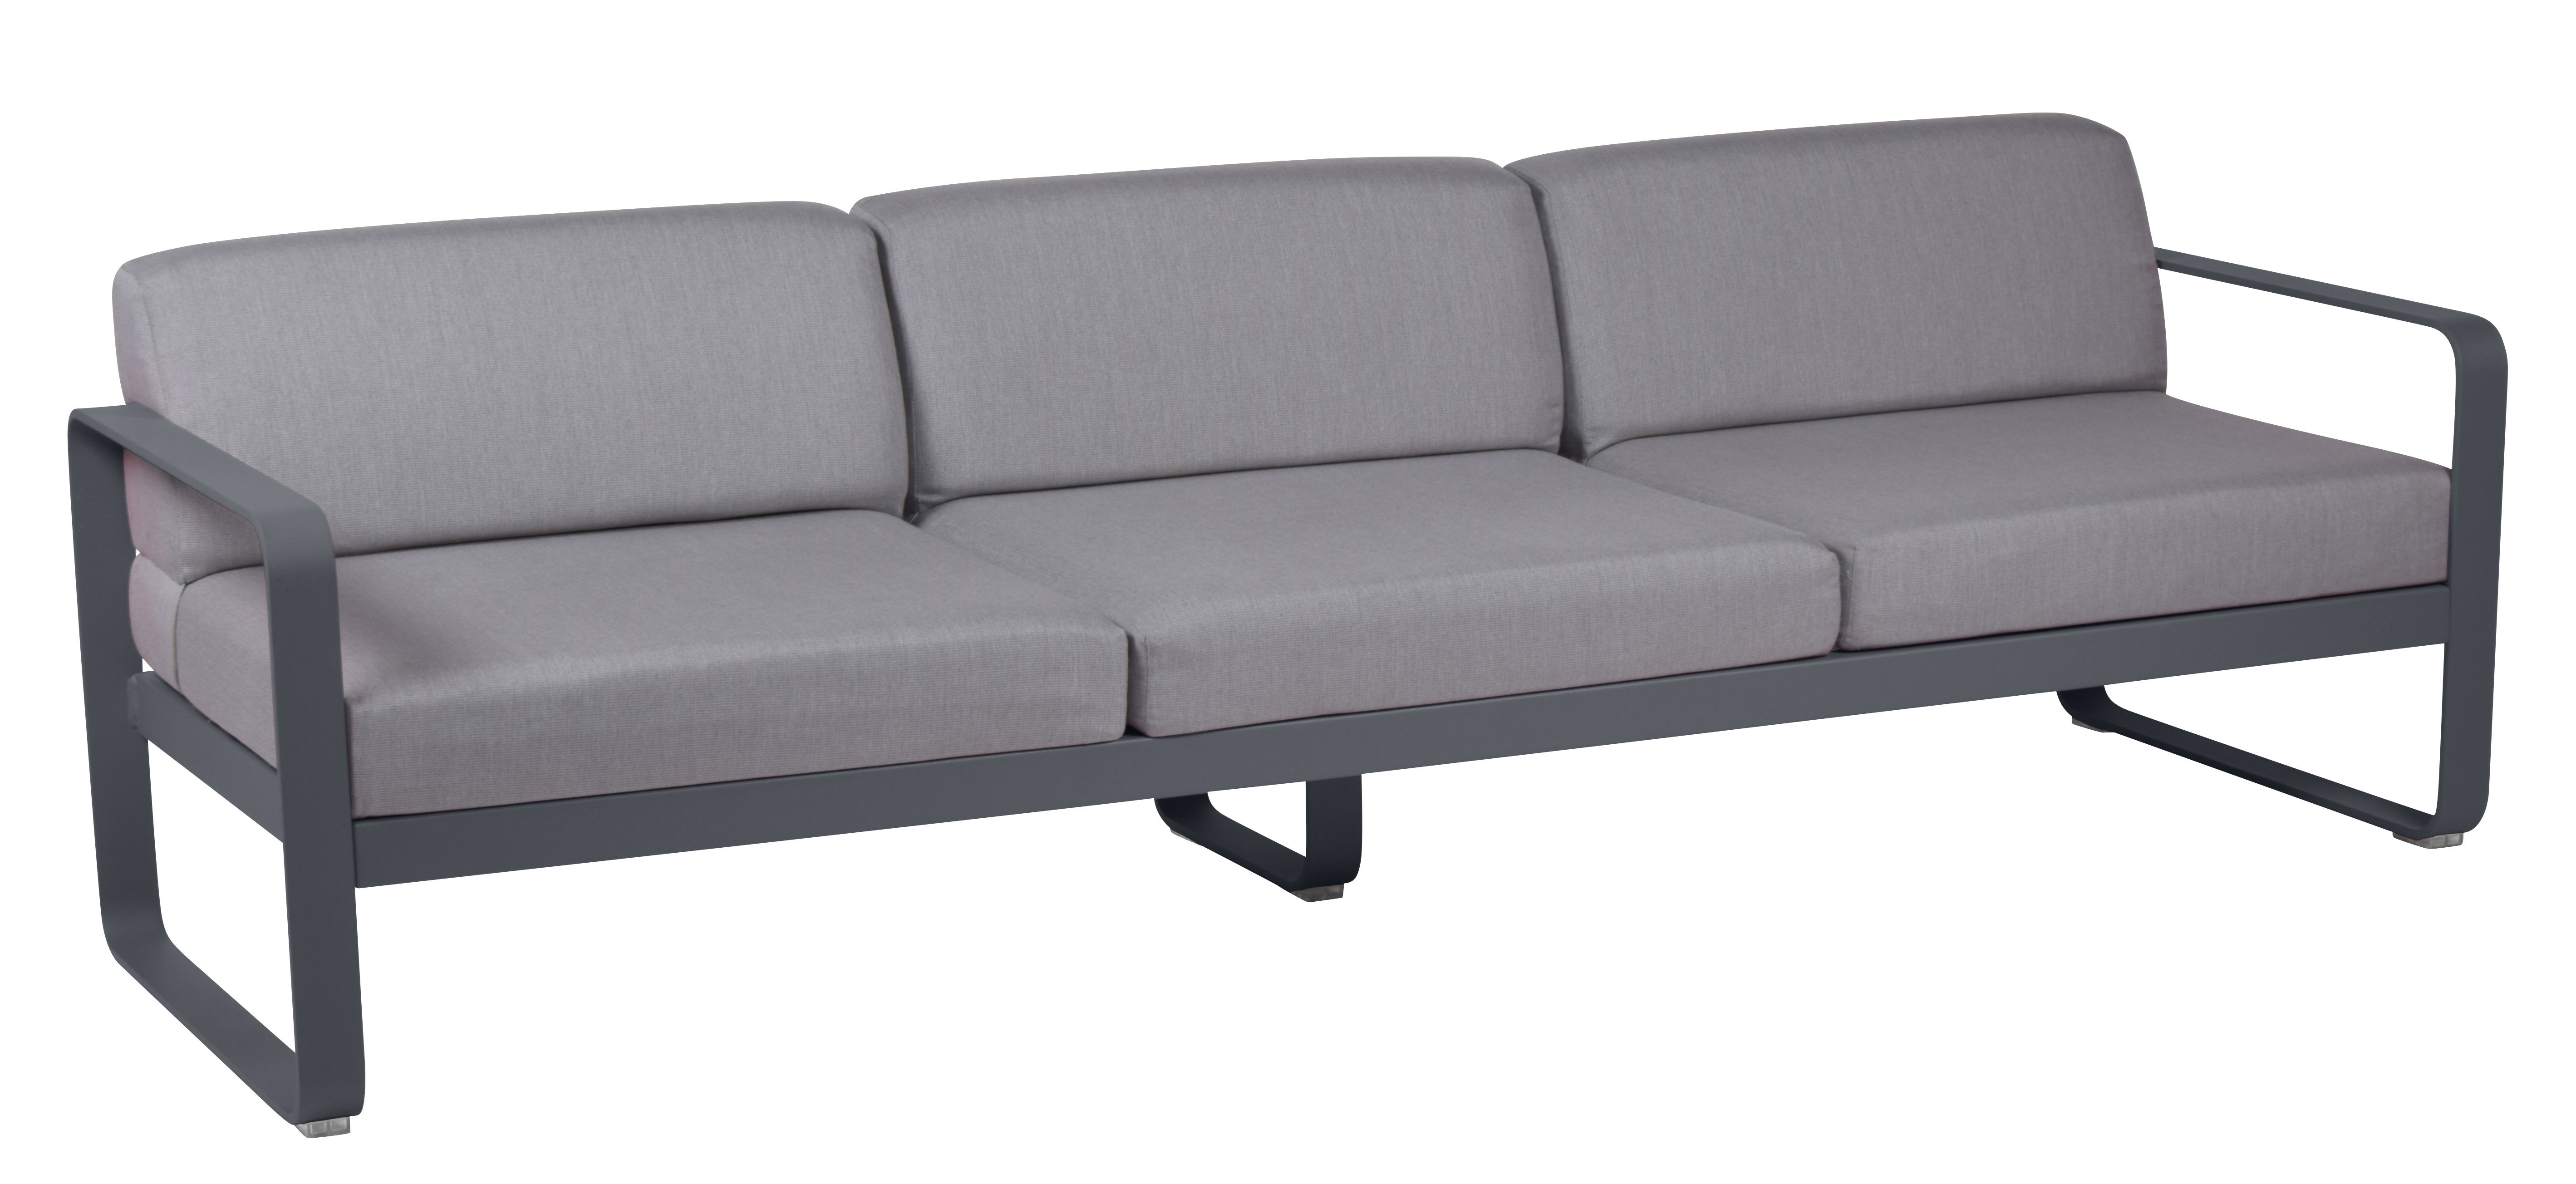 Furniture - Sofas - Bellevie Straight sofa - 3 seats / L 235 cm - Grey fabric by Fermob - Carbon / Grey flannel fabric - Acrylic fabric, Foam, Lacquered aluminium